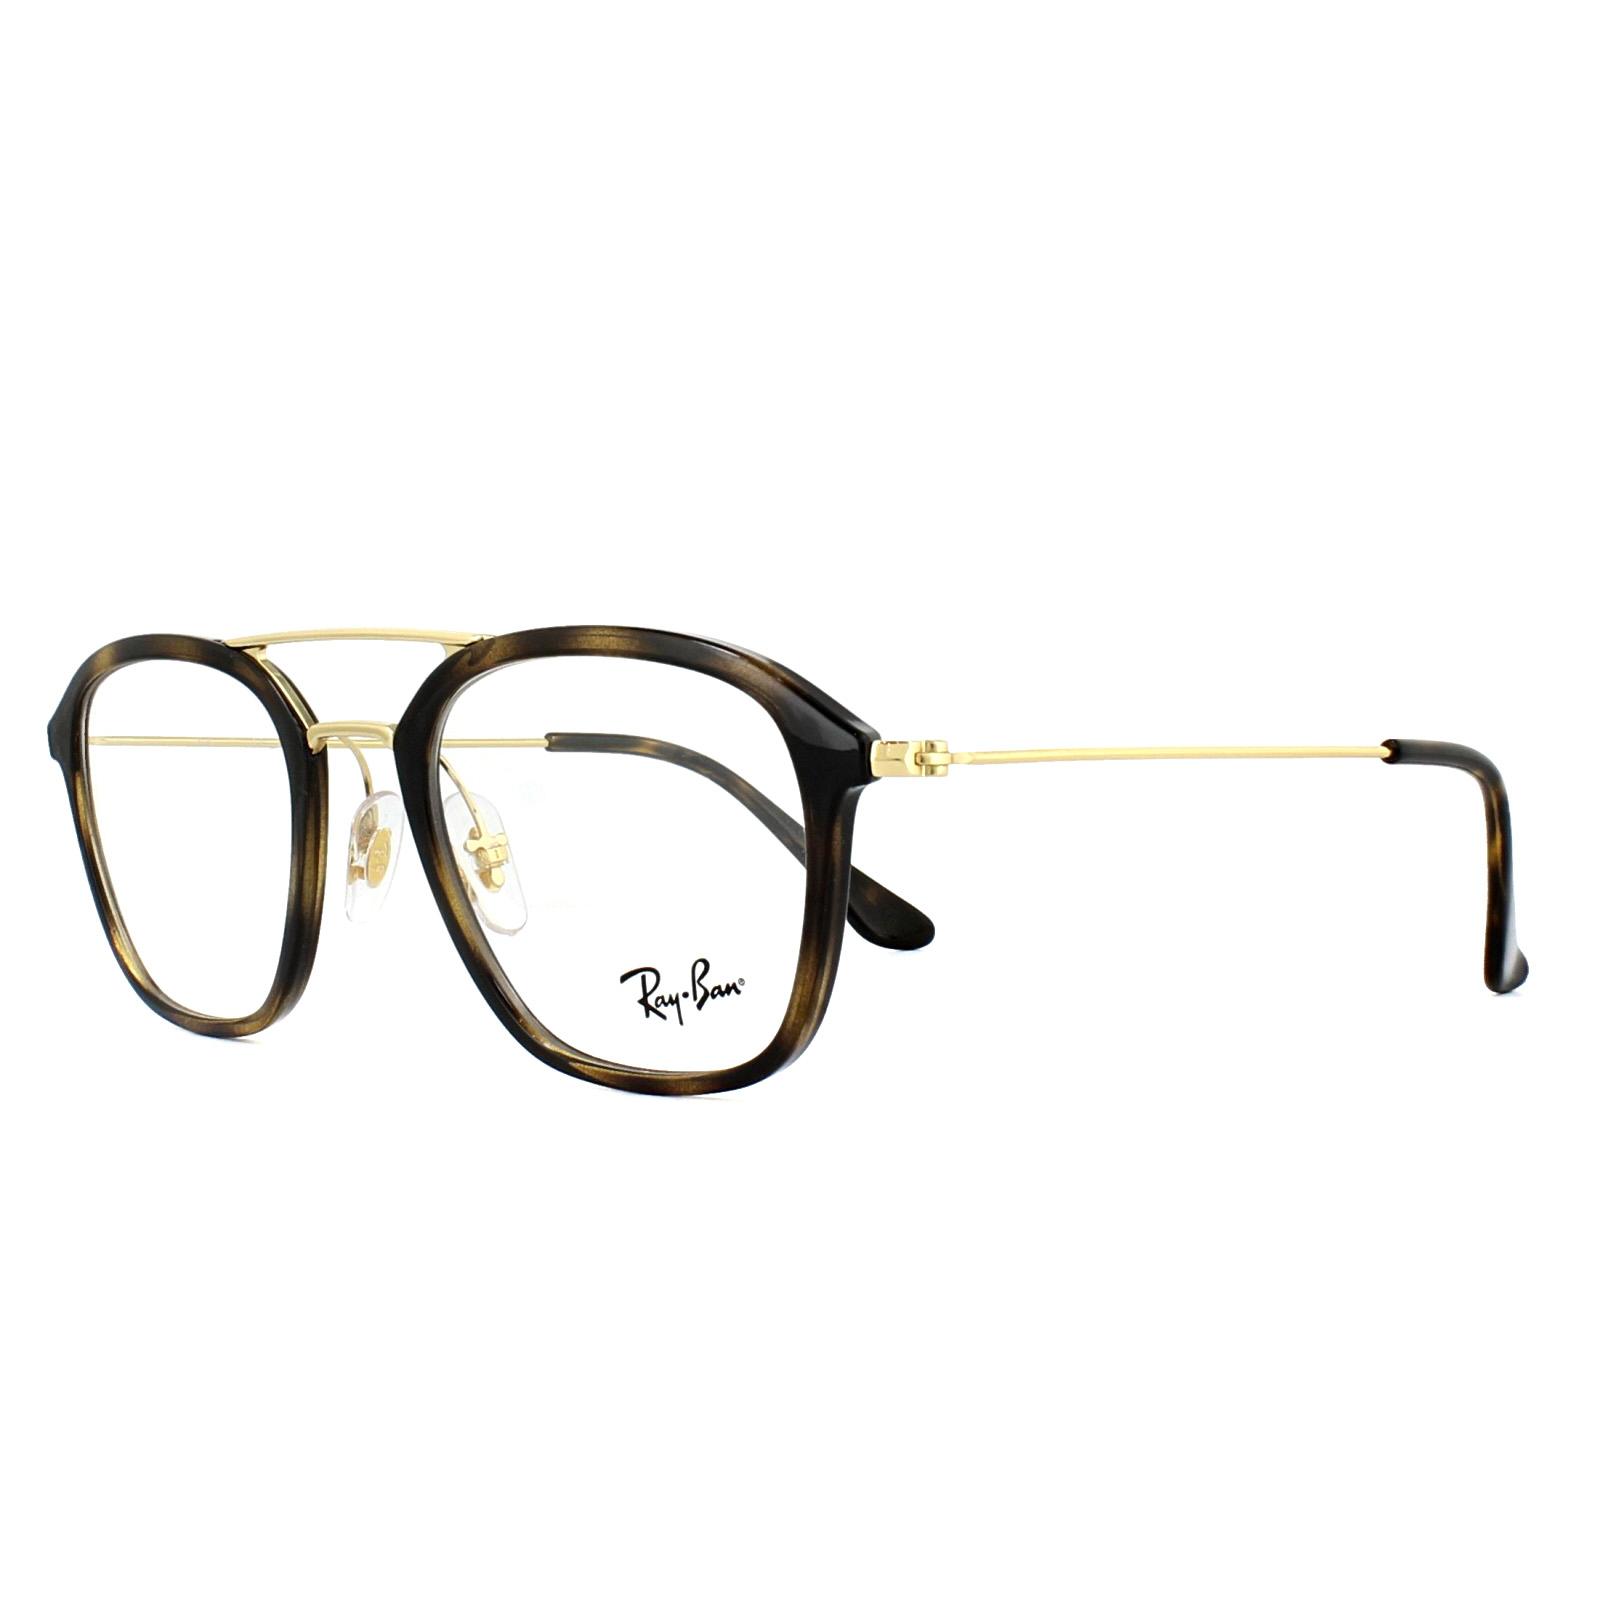 8670ef9095837 Ray-Ban Glasses Frames 7098 2012 Havana Gold 50mm Mens 8053672603736 ...